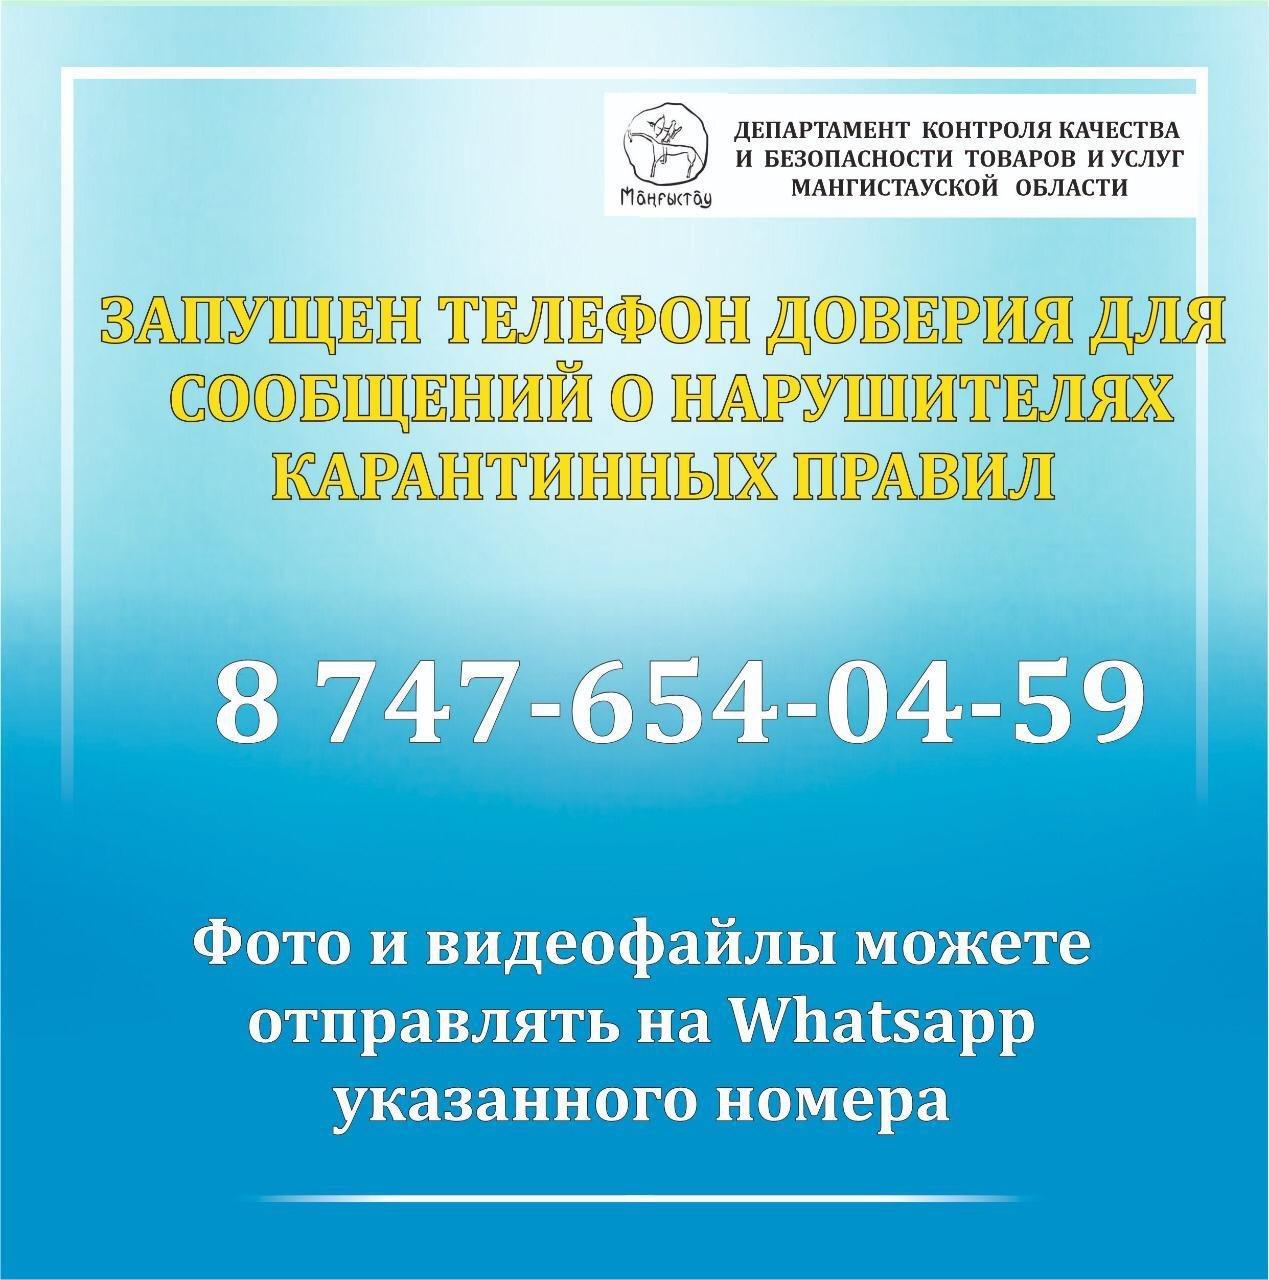 В Мангистау заработал телефон доверия по вопросам нарушения карантина, фото-2